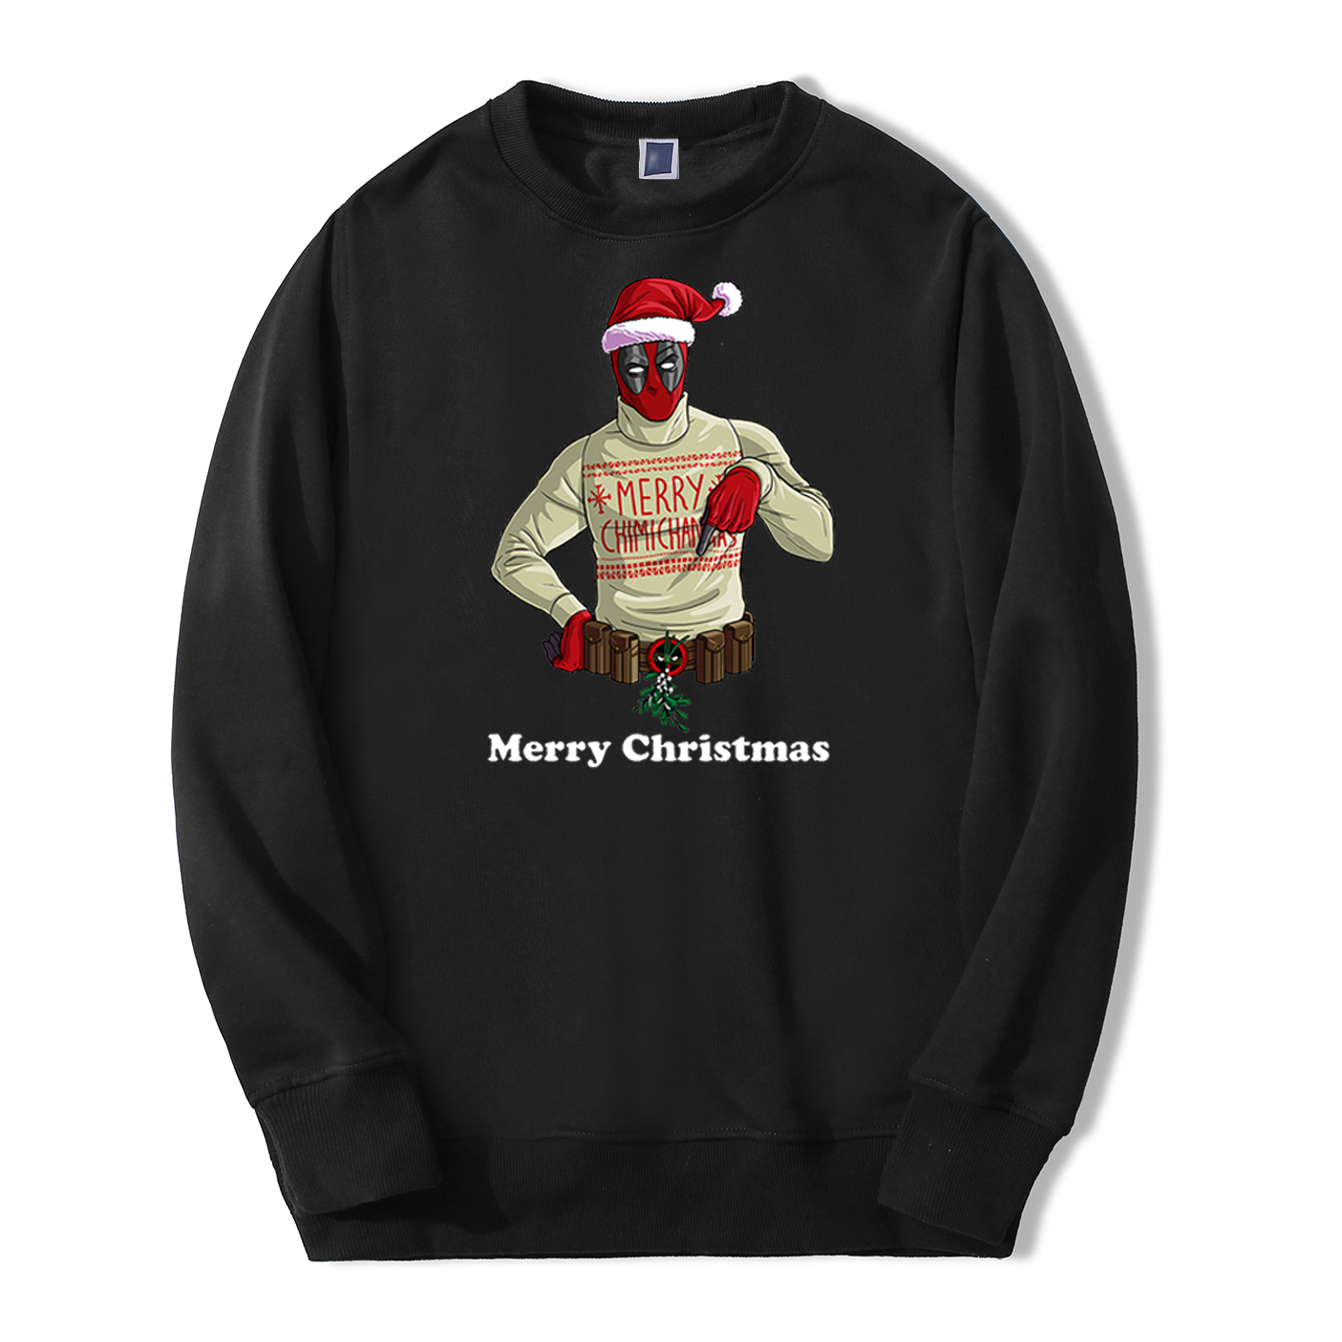 Merry Christmas Deadpool Mens Sweatshirts Hoodie Casual Fleece Streetwear Autumn Sweatshirt Fashion Happy New Year Warm Hoodies